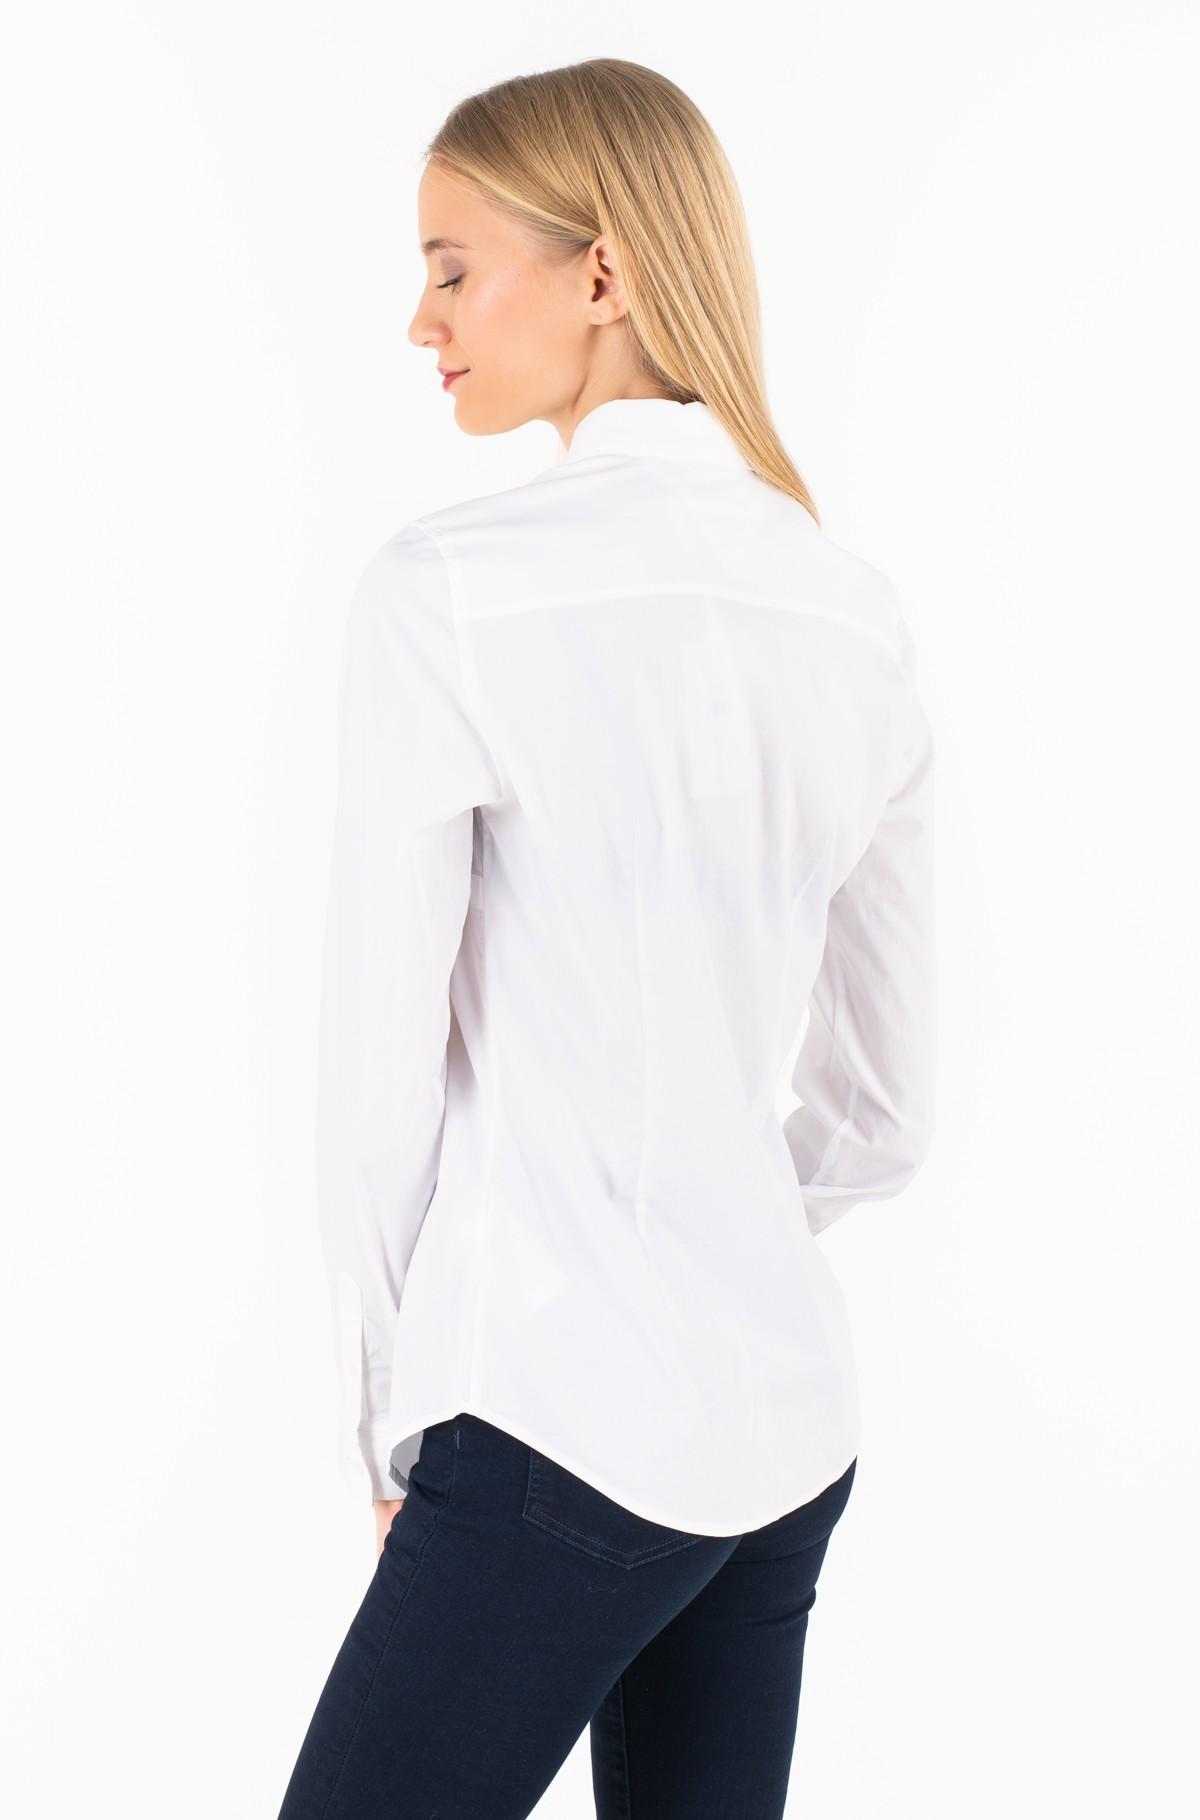 Marškiniai LIBBY SHIRT LS W2-full-2